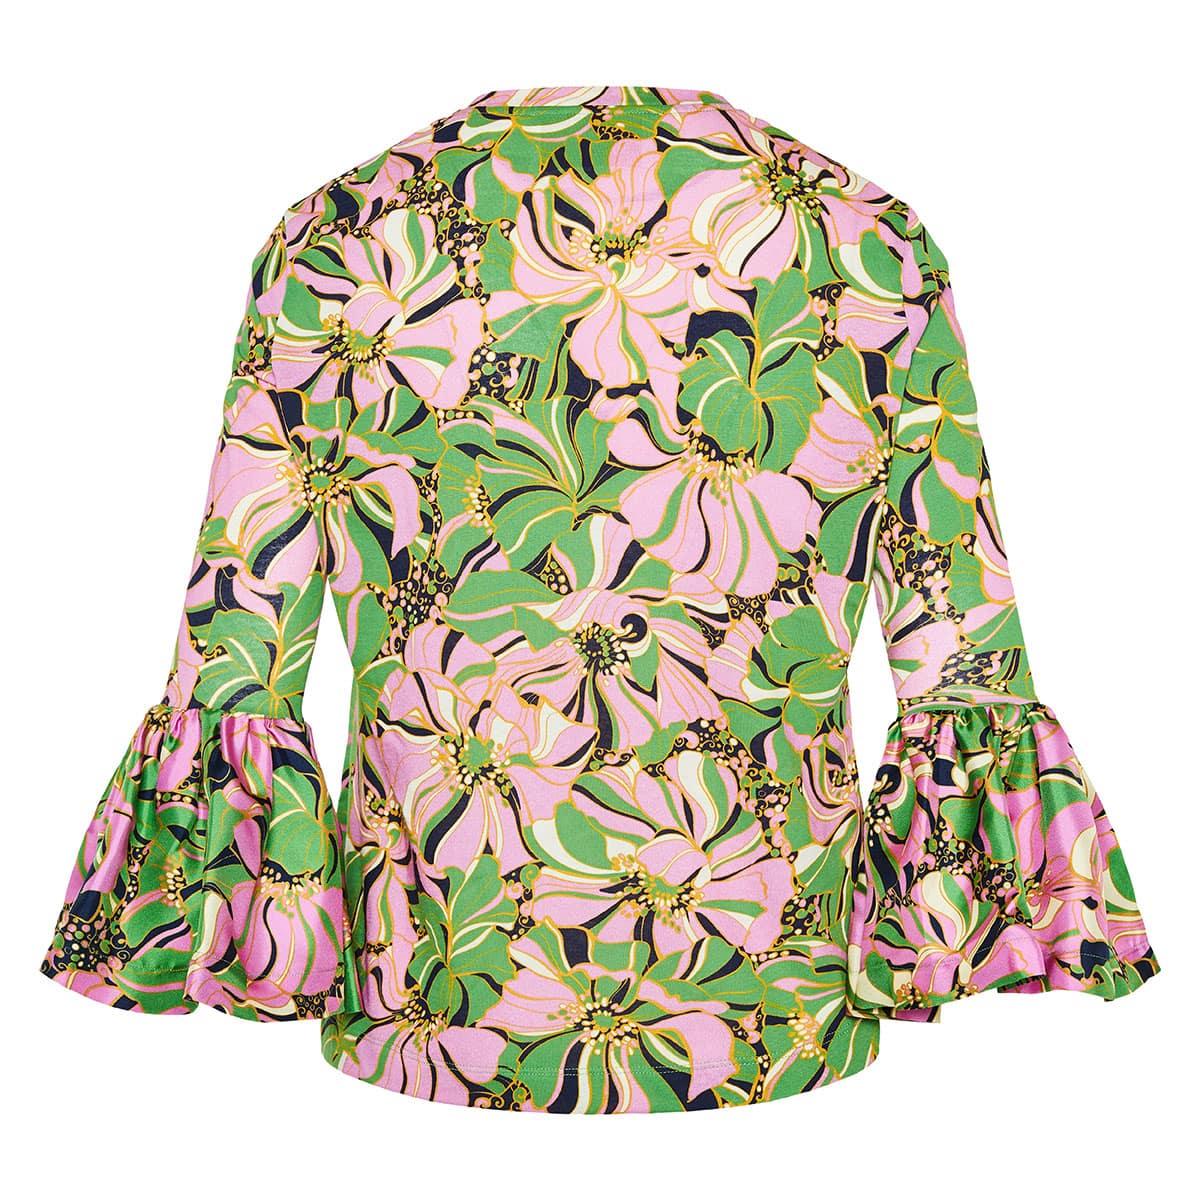 Gemini ruffled-cuff floral blouse